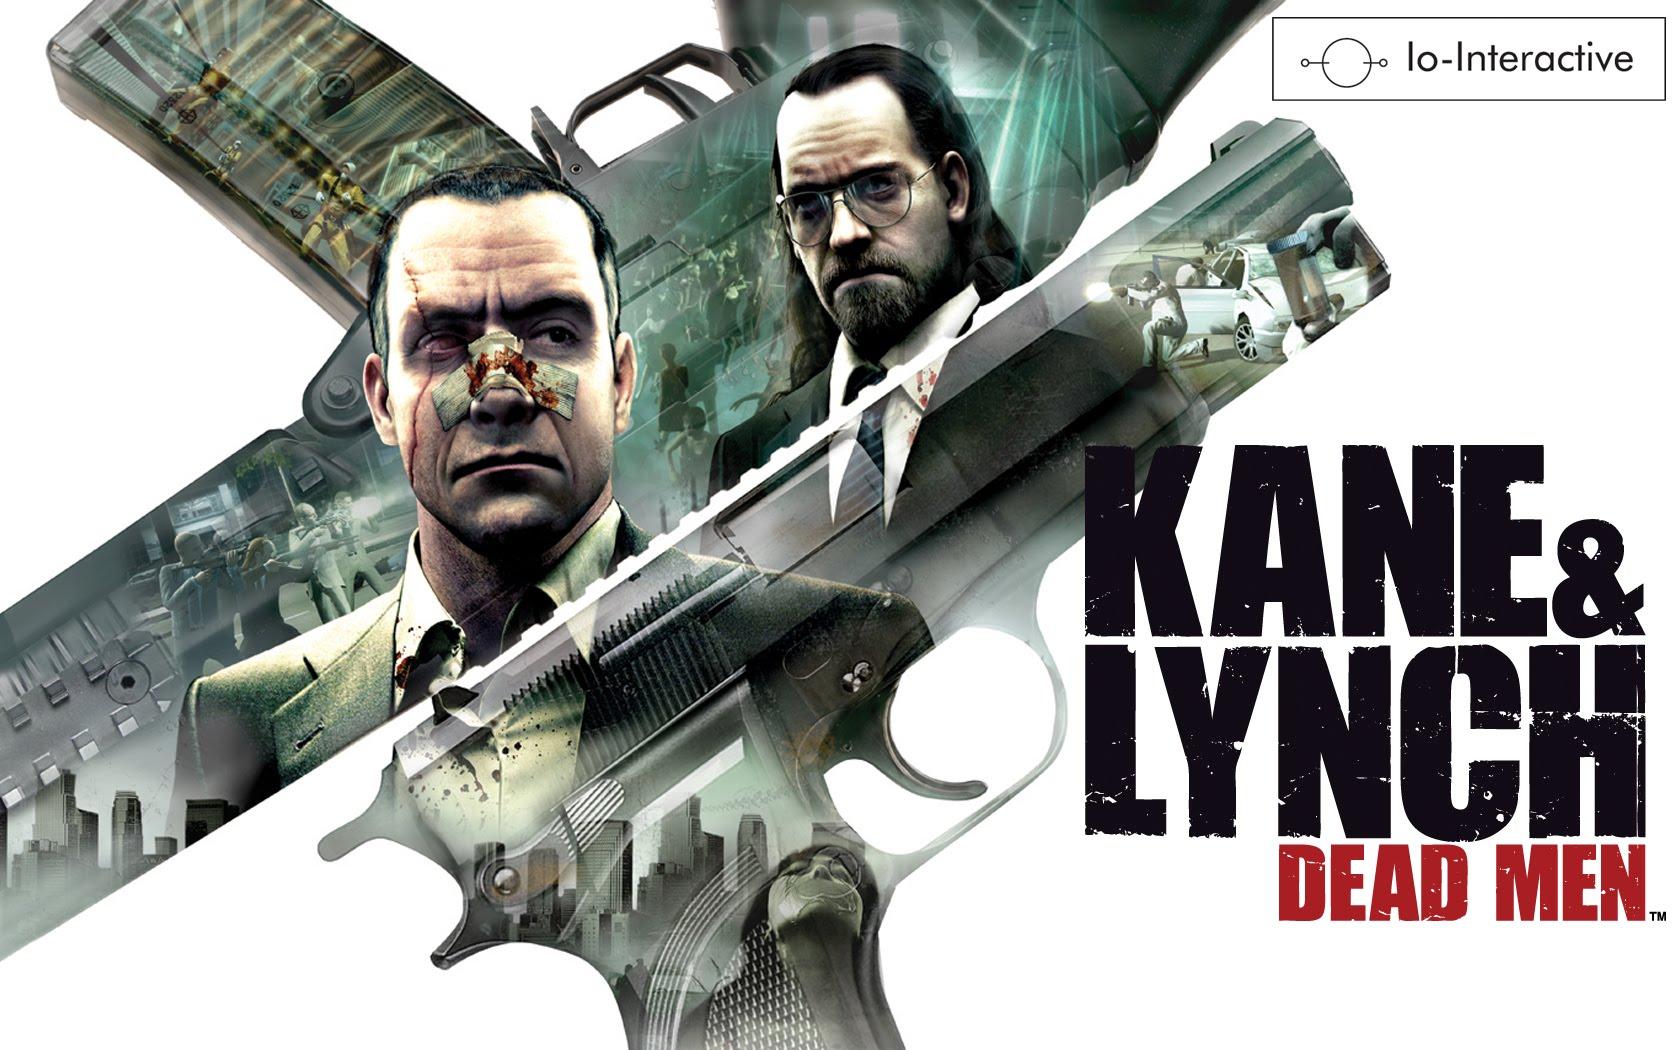 Kane & Lynch: Dead Men  Xbox 360, PS3, Pc IO Interactive 2007